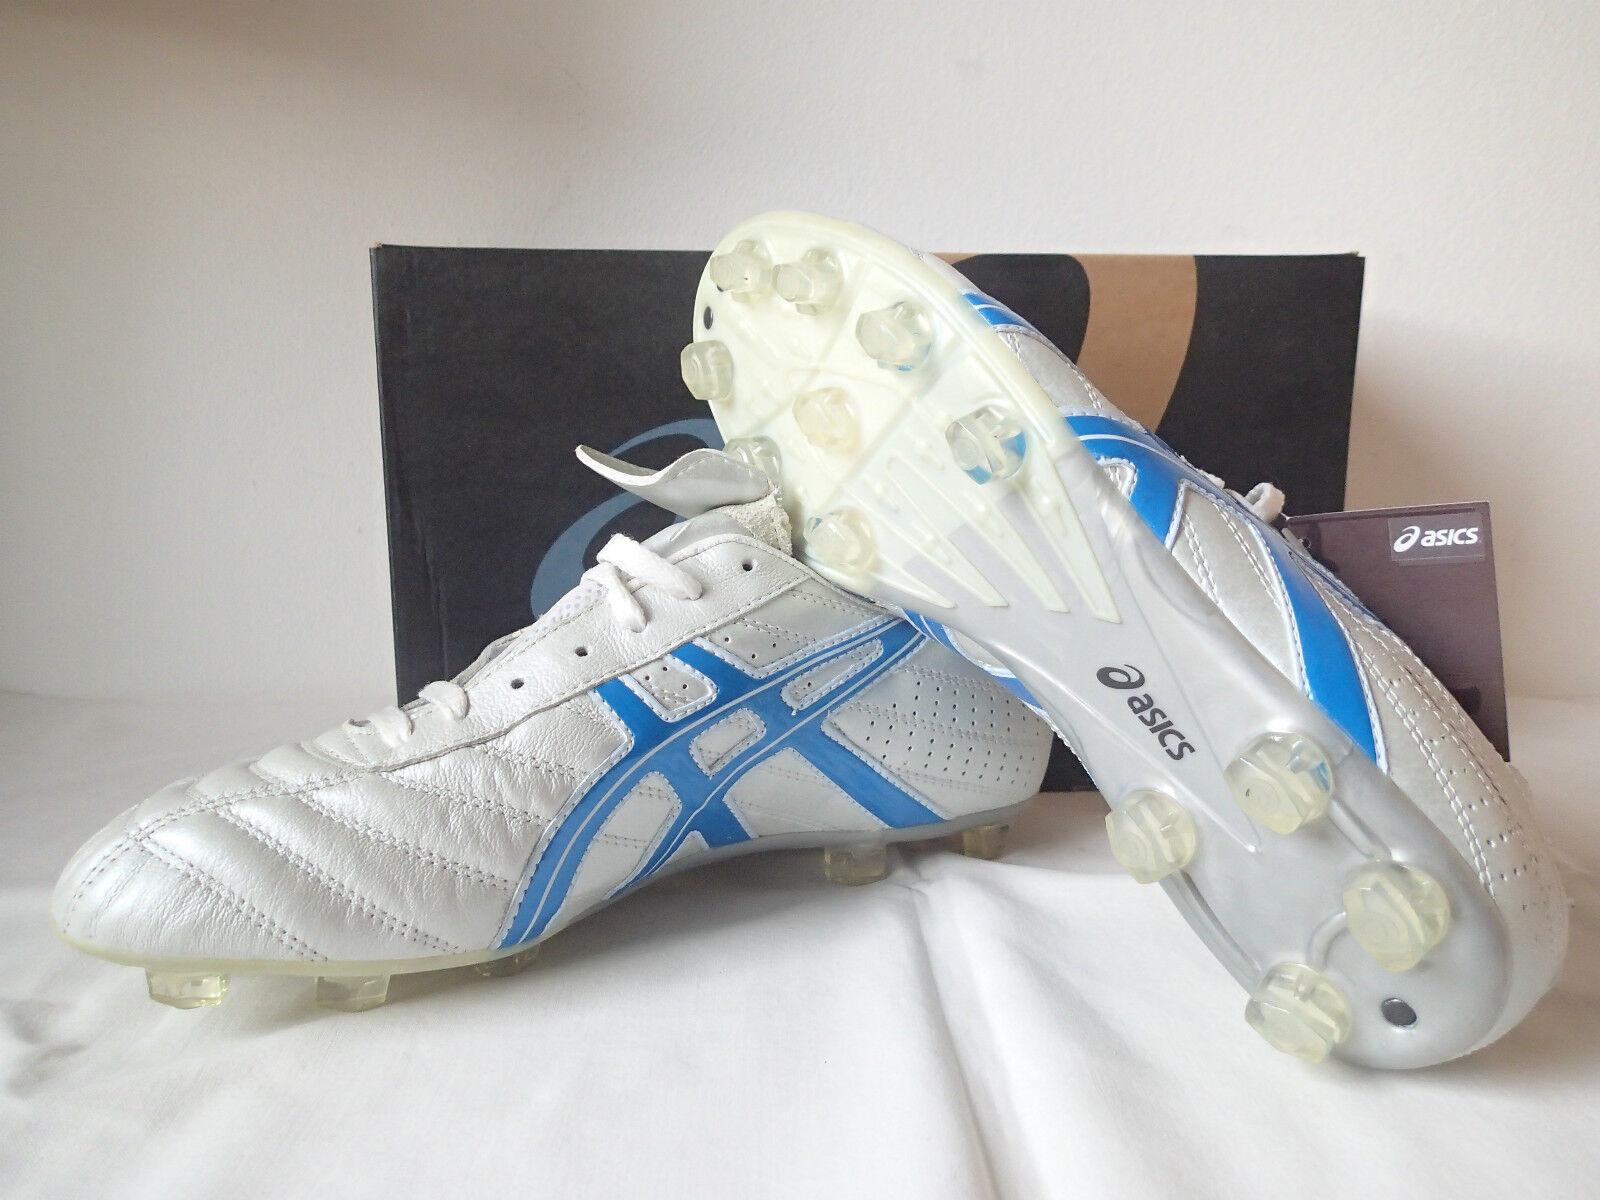 ASICS DS DS ASICS LIGHT CS PRO scarpe calcio-football Stiefel-fussballschuhe 39776e